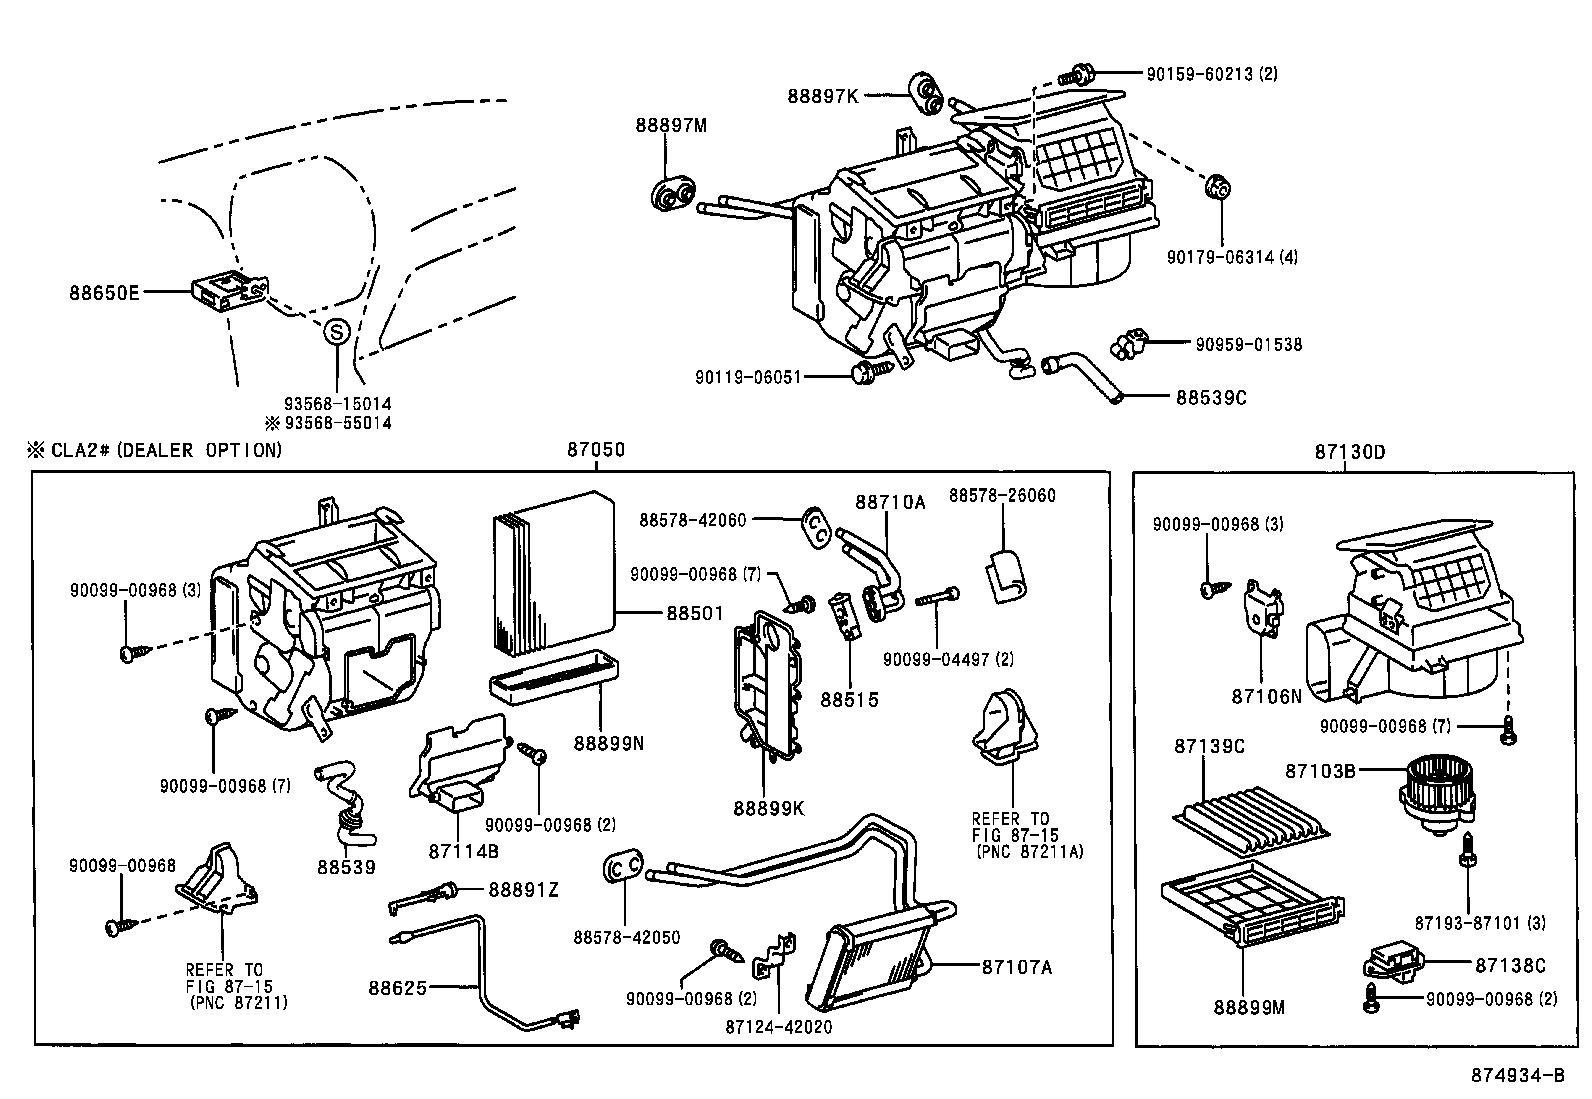 2001 Rhd Toyota Rav4 Engine Diagram